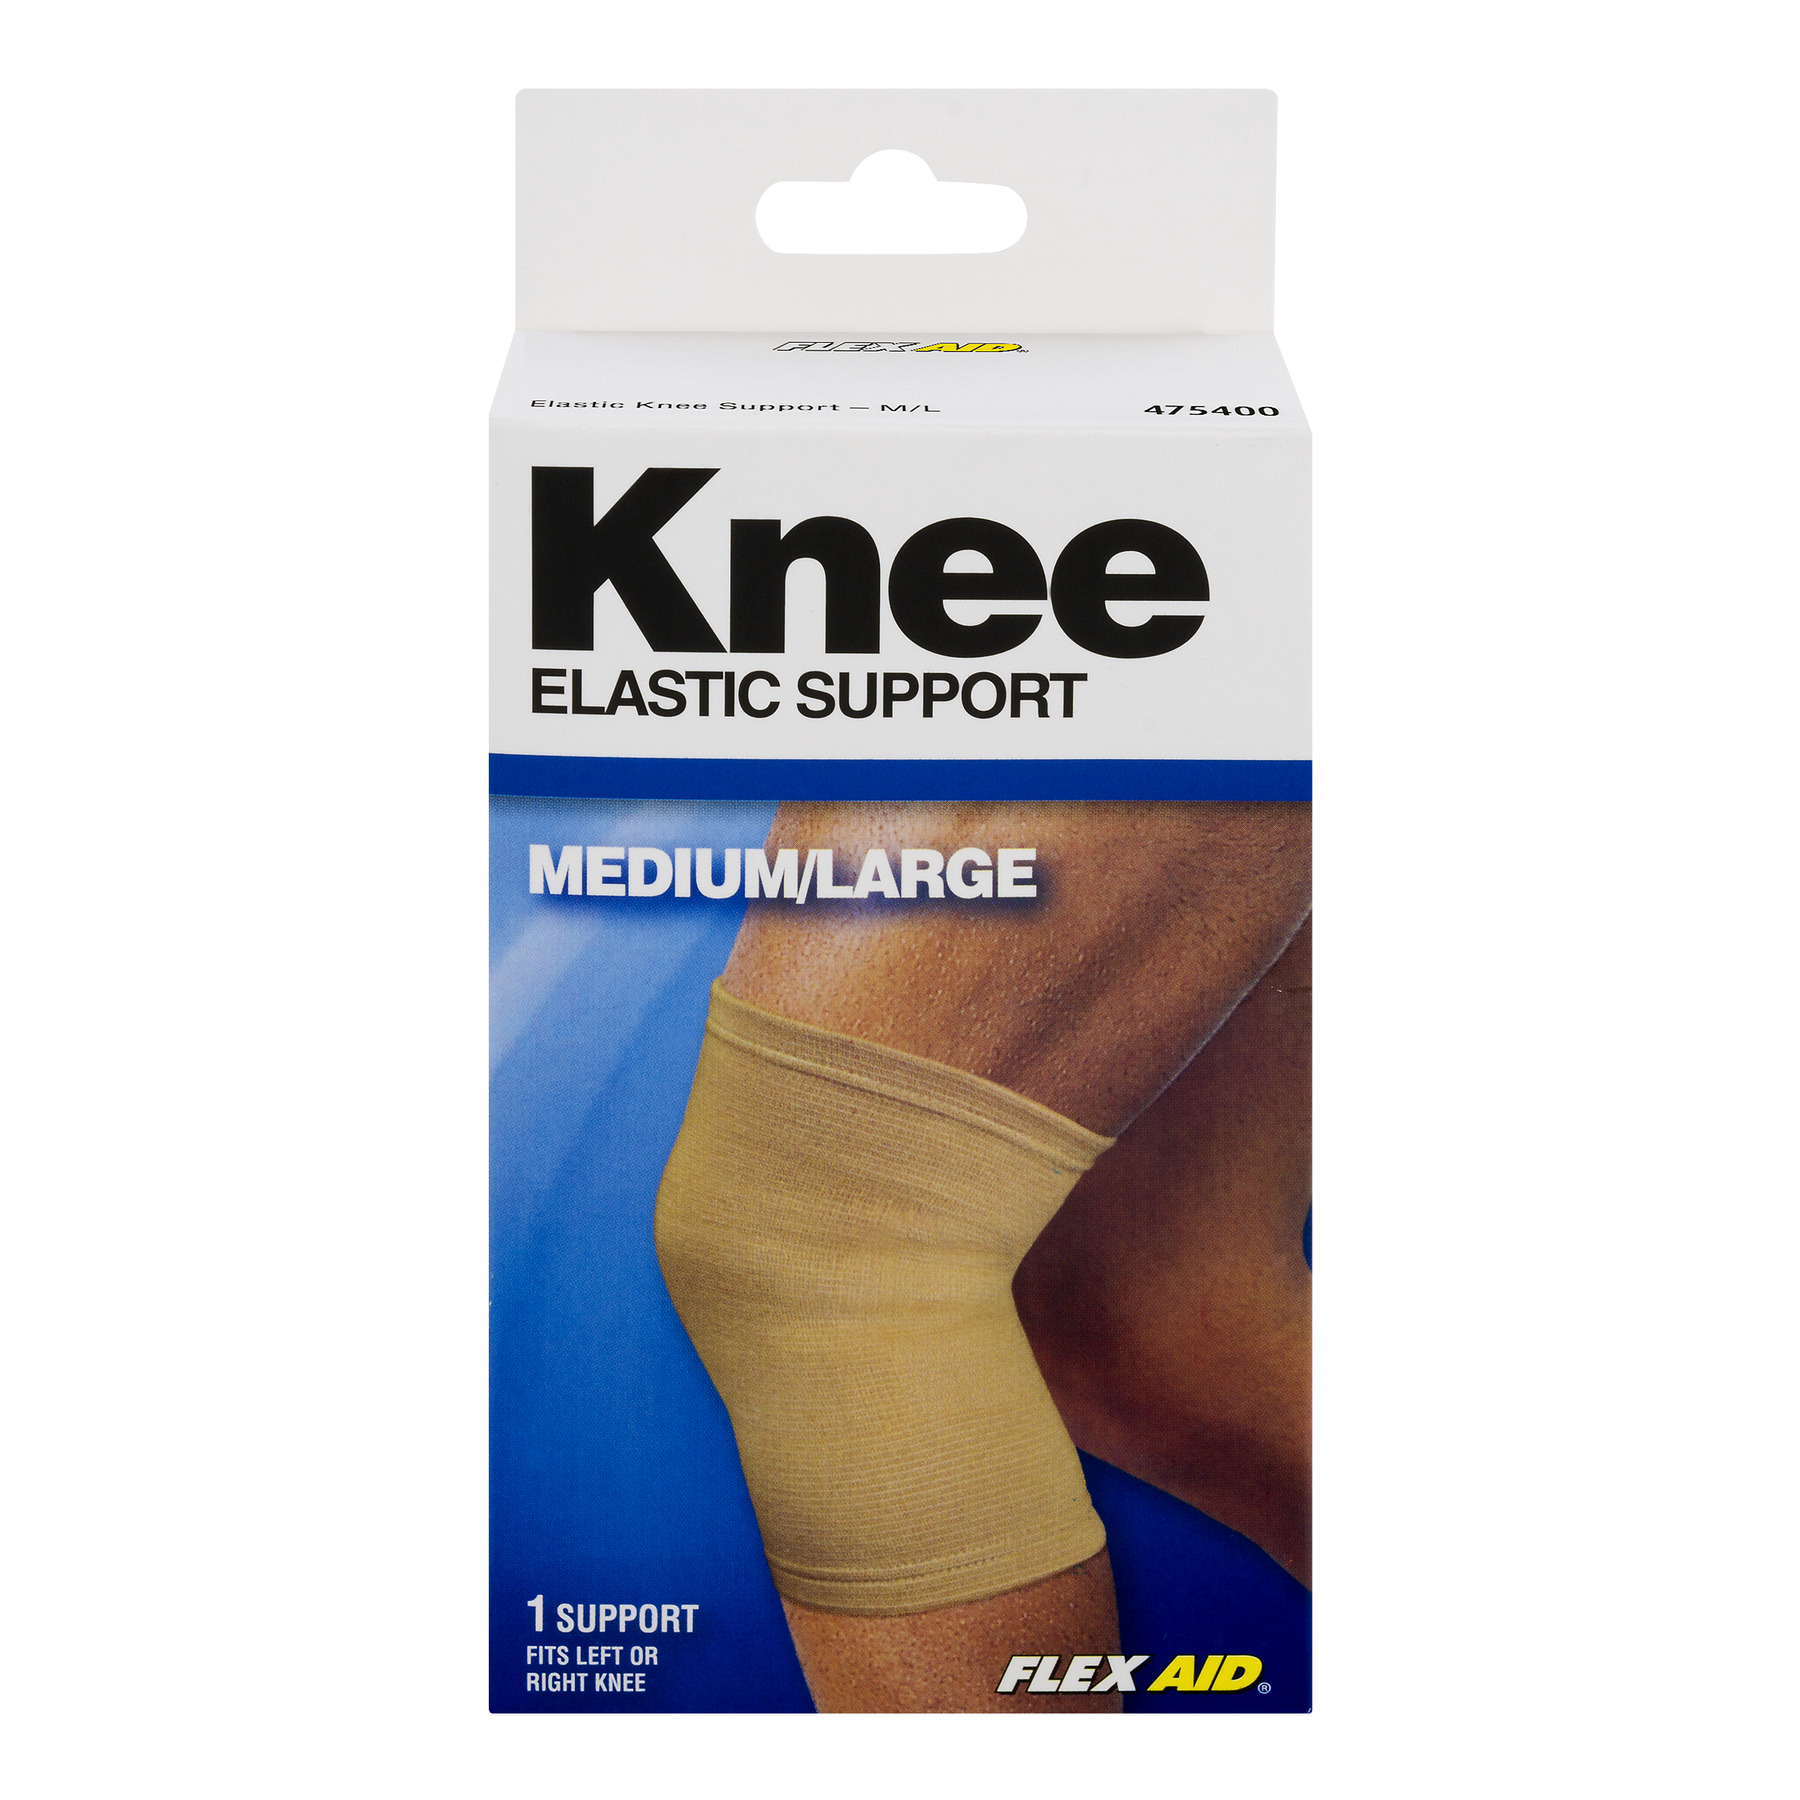 Flex Aid Knee Elastic Support Medium Large 1 0 Ct Walmart Com